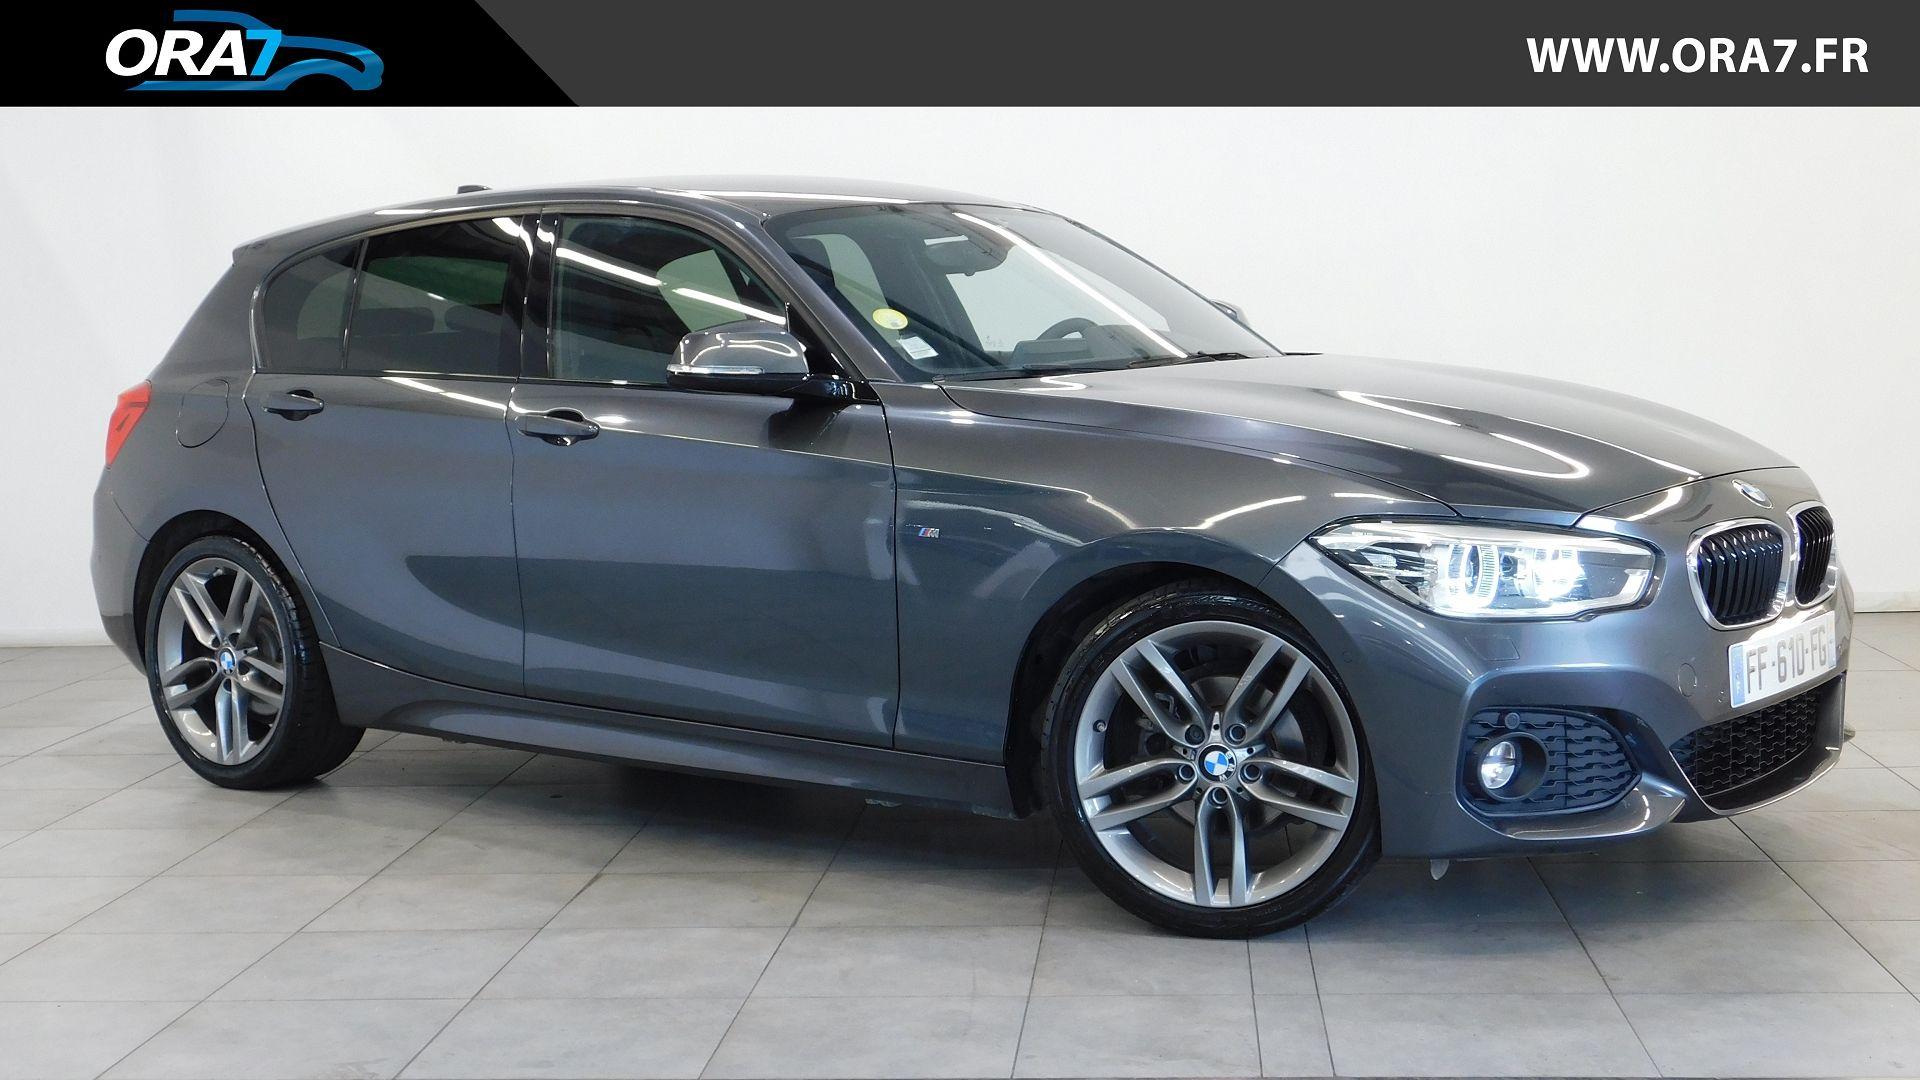 BMW SERIE 1 (F21/F20) 118DA 150CH M SPORT 5P EURO6C d'occasion dans votre centre ORA7